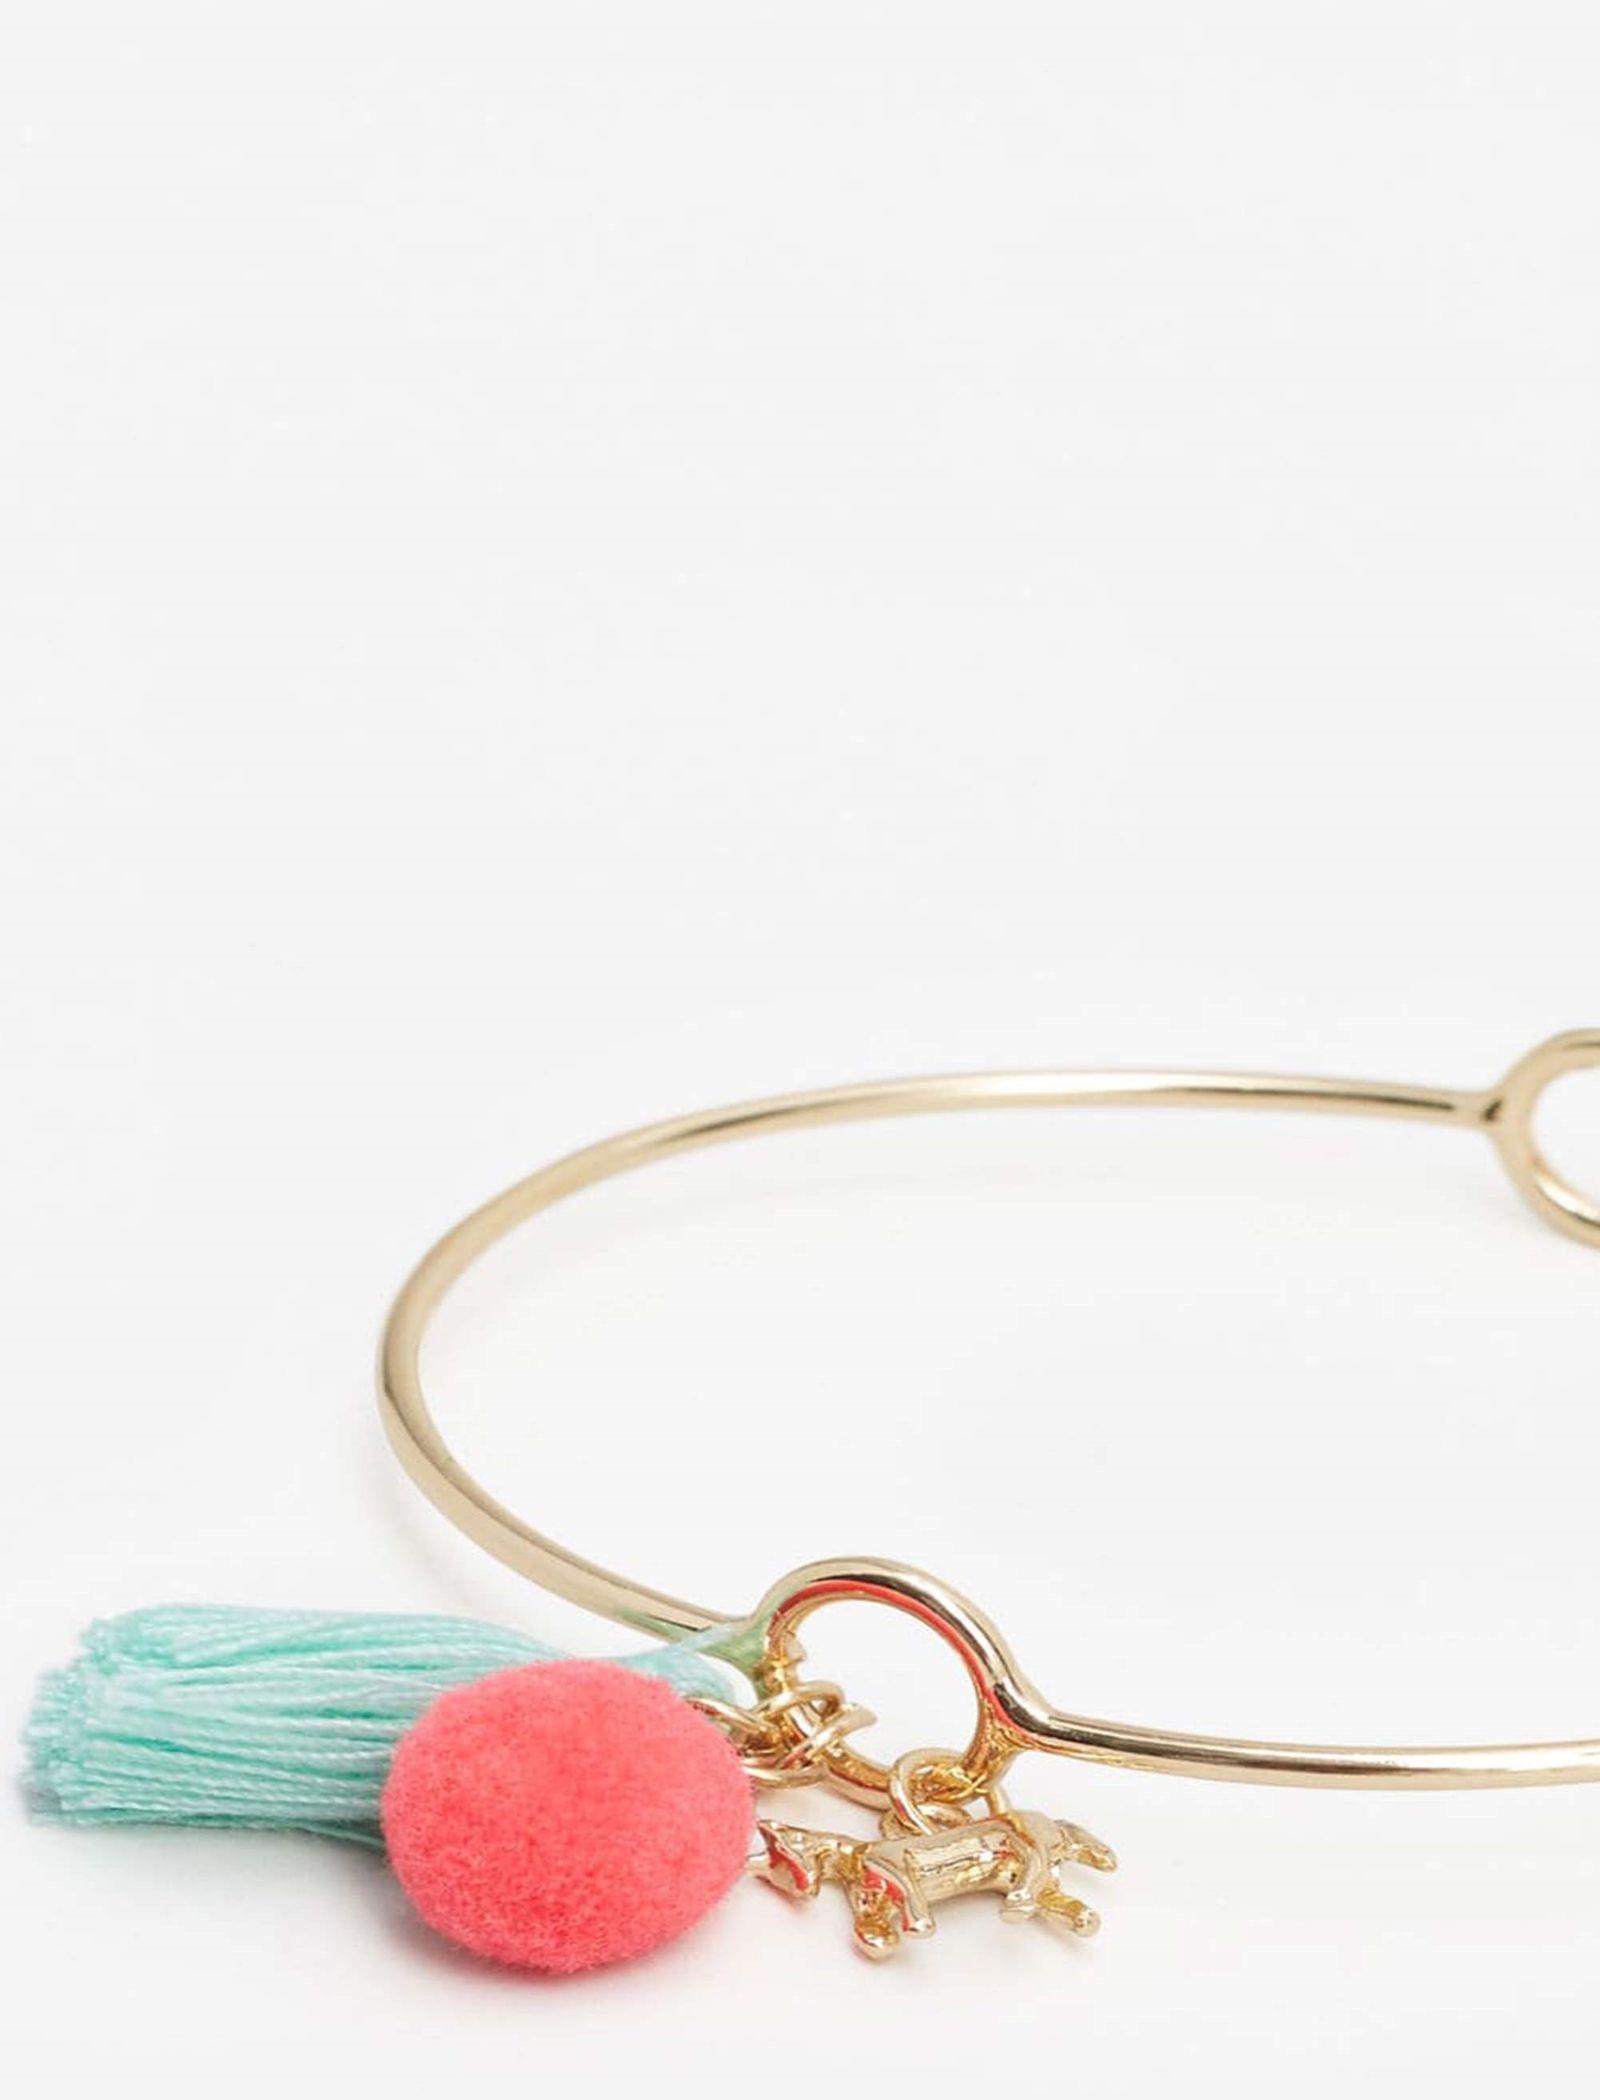 دستبند فلزی دخترانه - مانگو - طلايي - 2